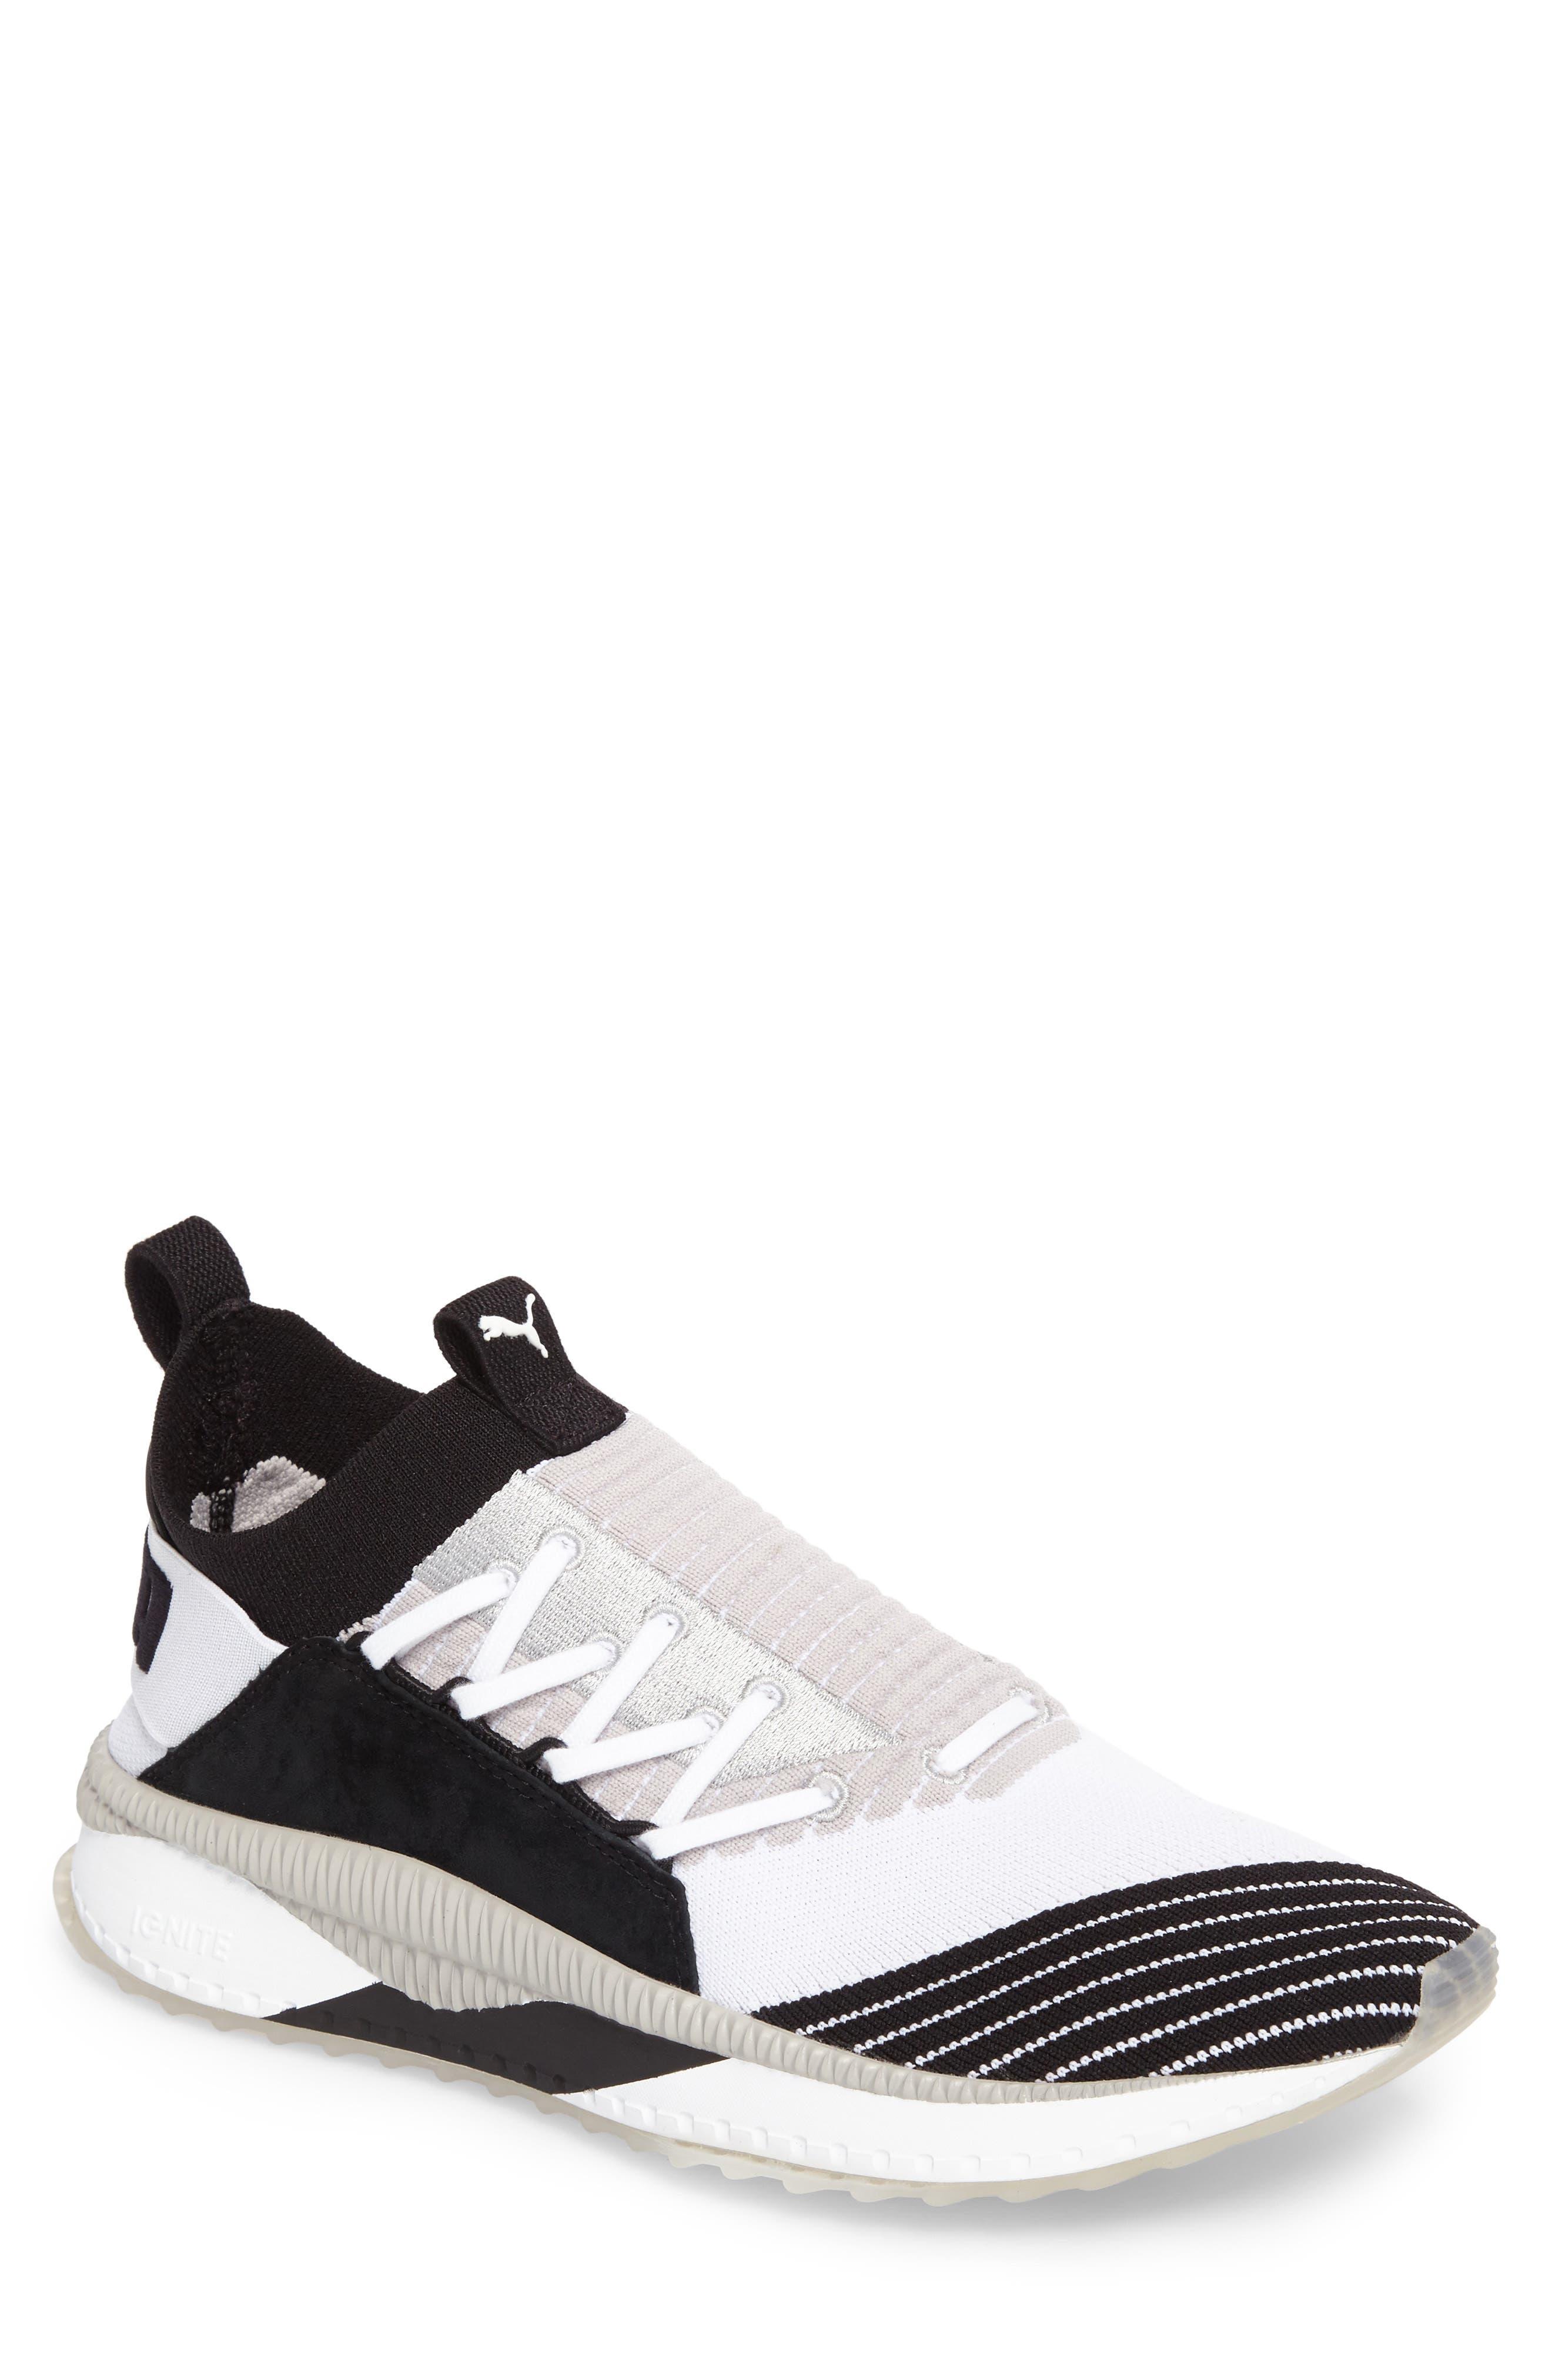 PUMA Tsugi Shinsei UT Odyssey Sneaker (Men)